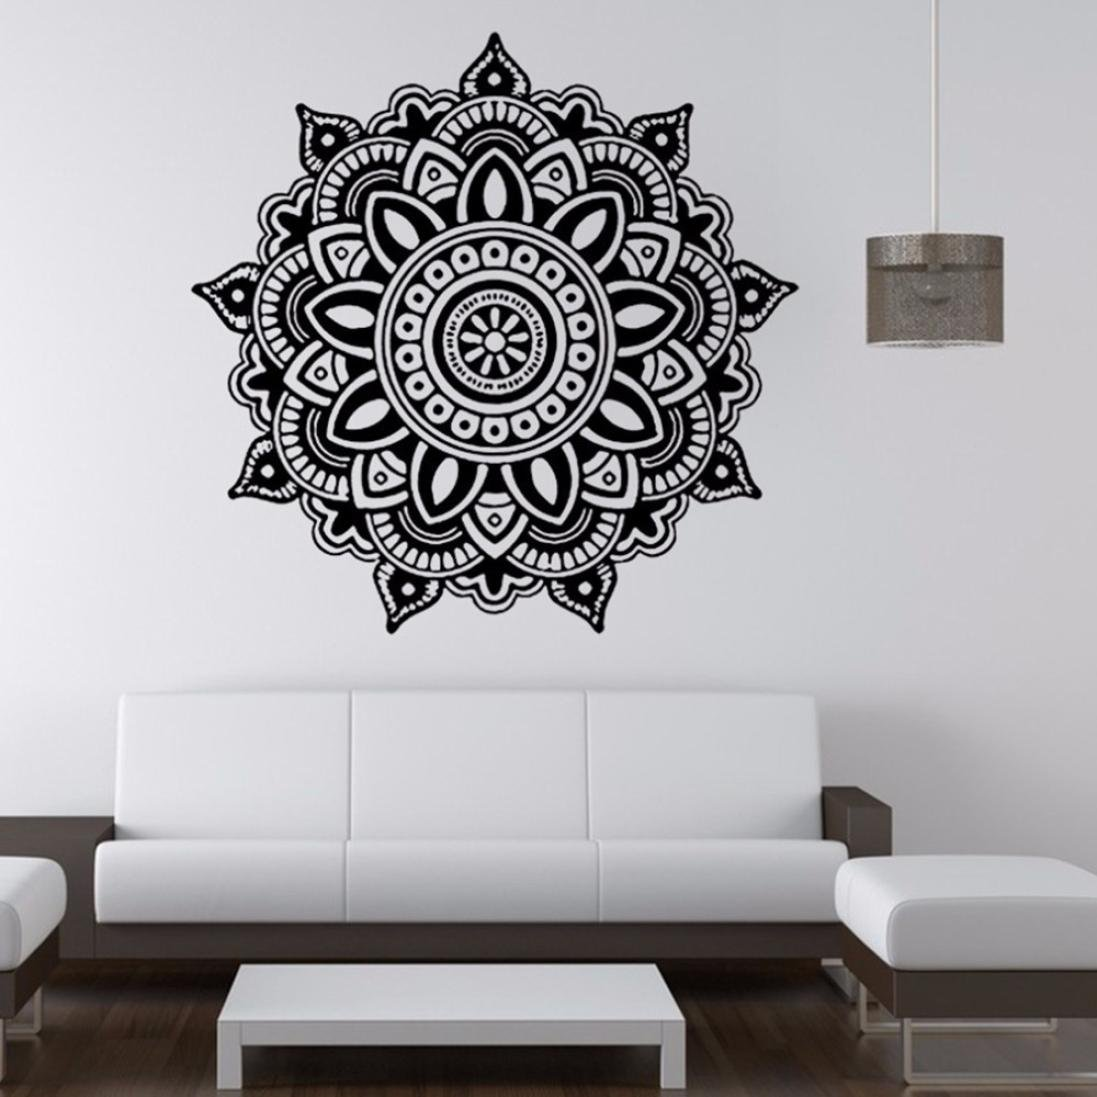 Amazon wall stickerlaimeng indian mandala flower mural home amazon wall stickerlaimeng indian mandala flower mural home vinyl family bedroom wall decal home kitchen amipublicfo Images